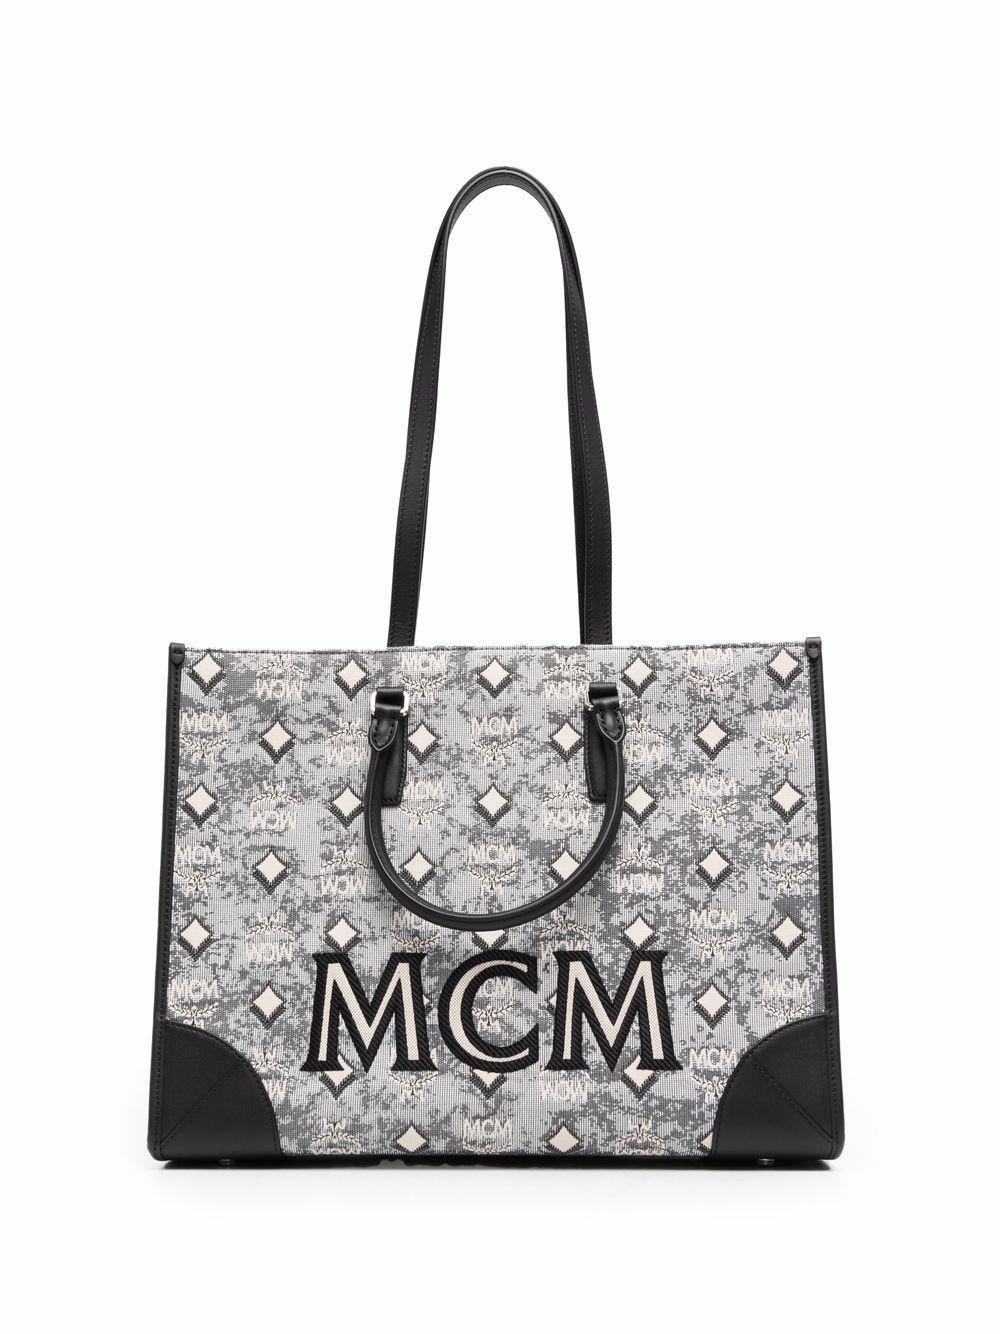 MCM Handtasche mit Jacquardmuster - Schwarz